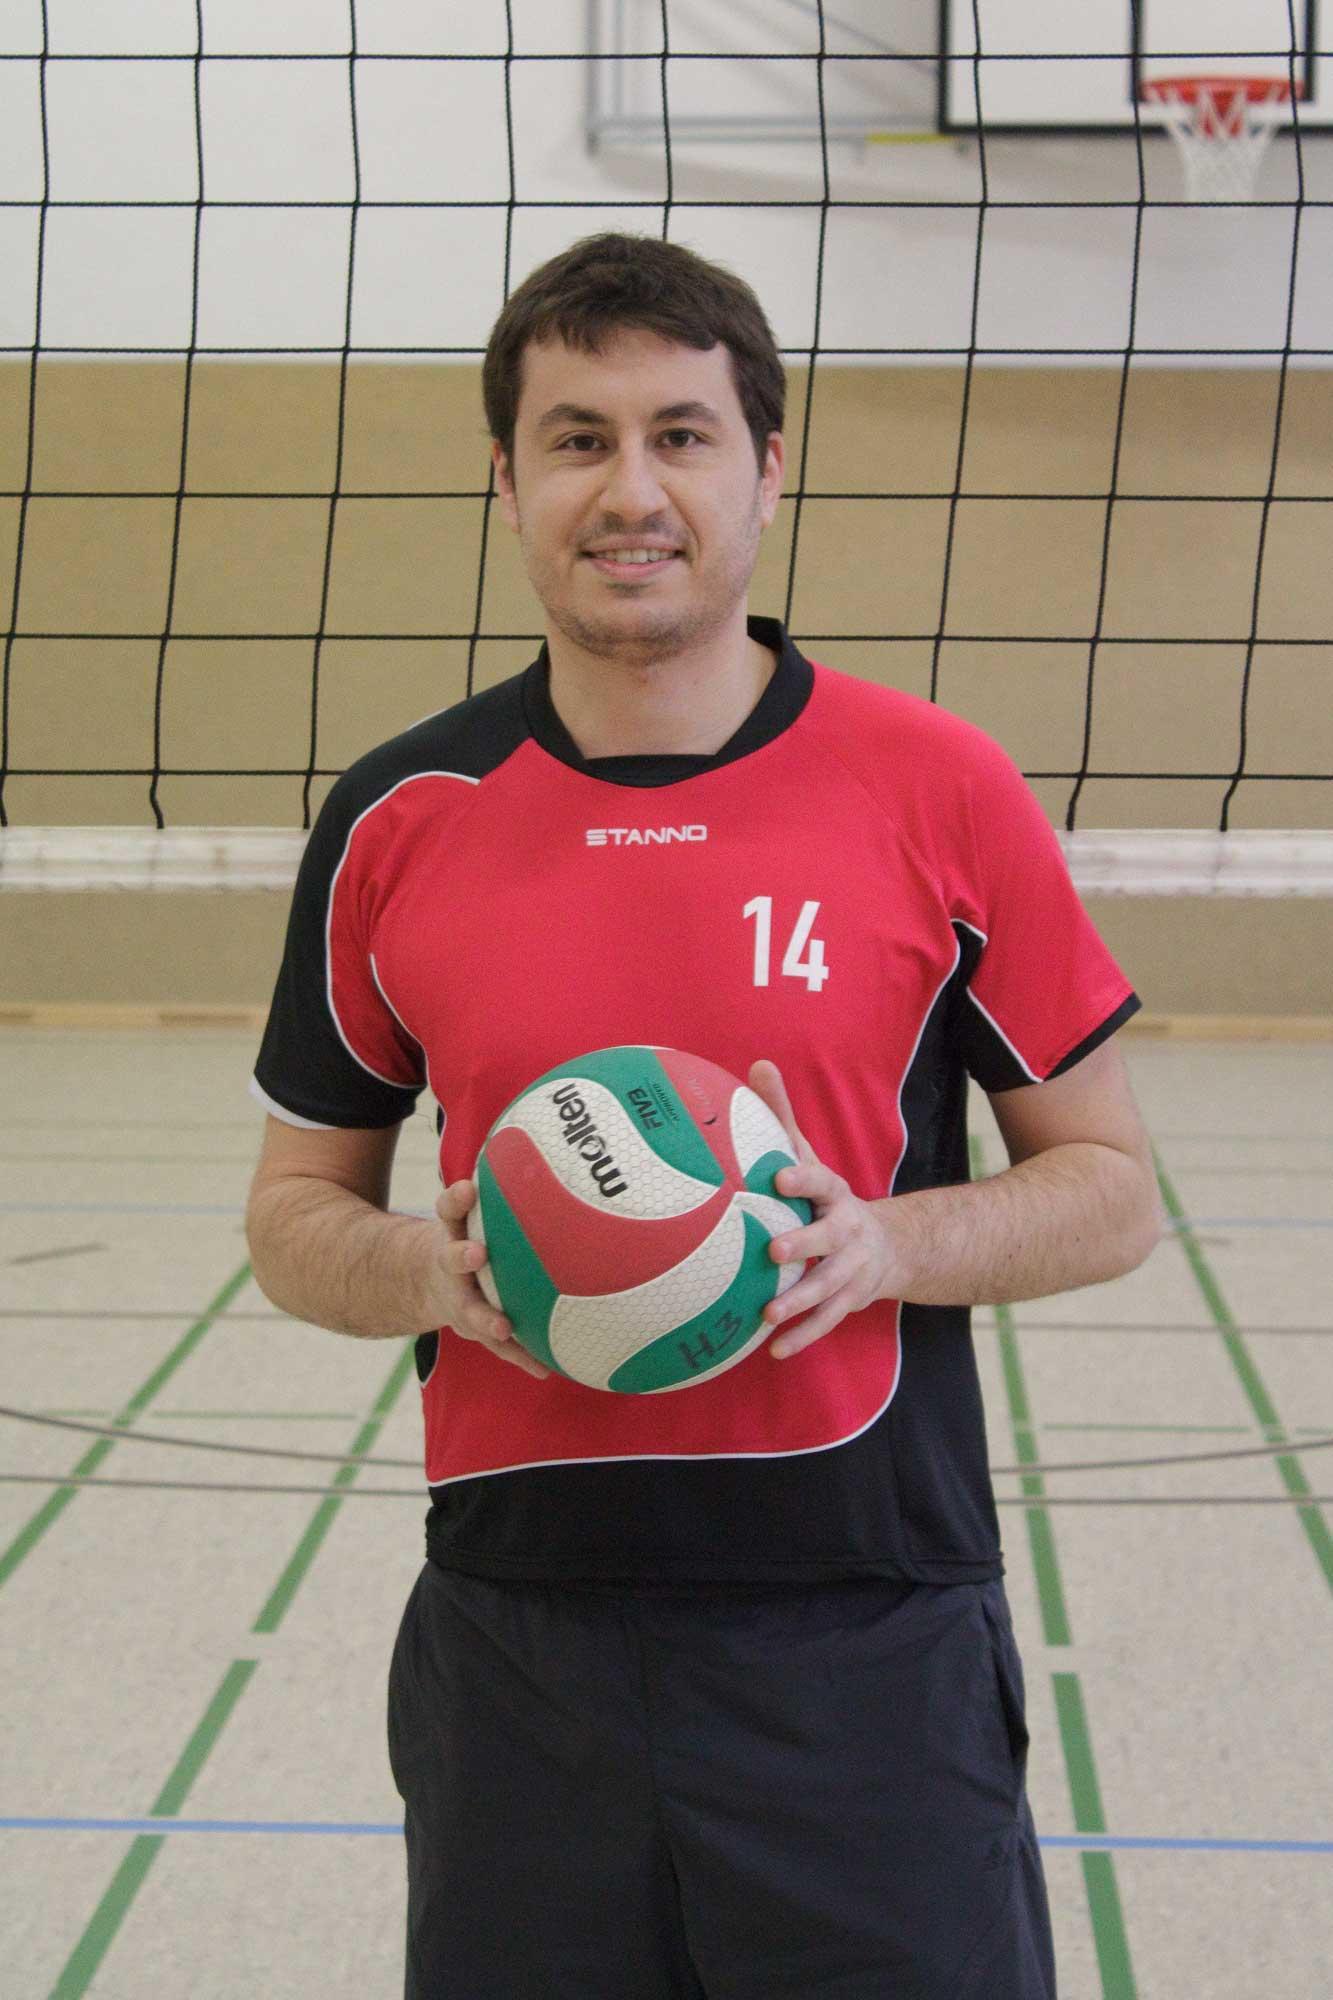 Alexandre Ktourza